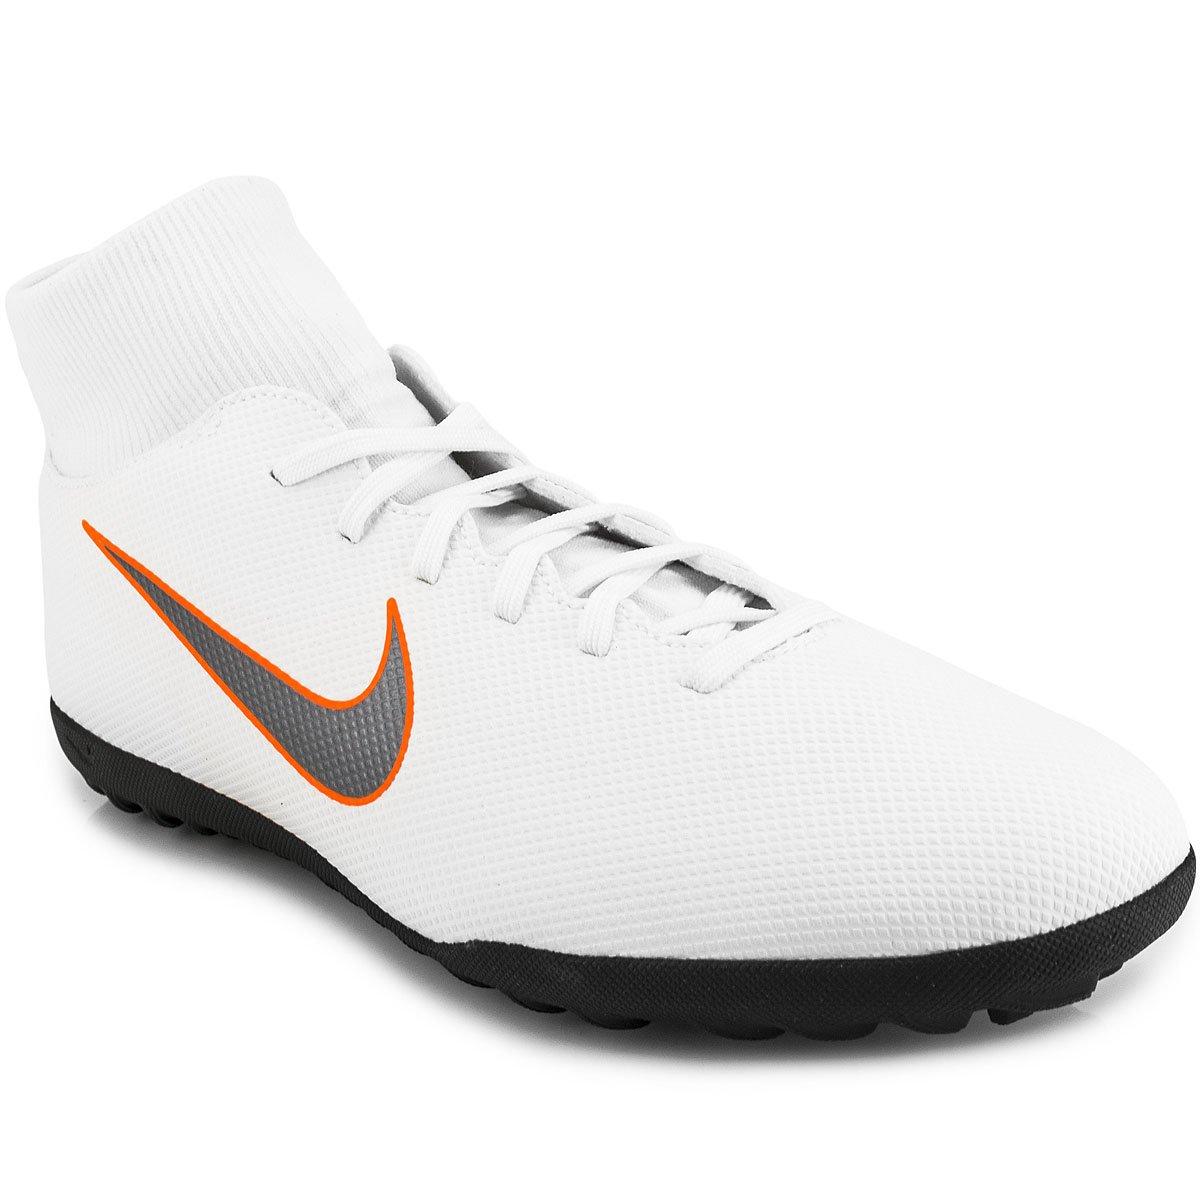 c63eb954b8 Chuteira Nike Mercurial Superfly 6 Club TF